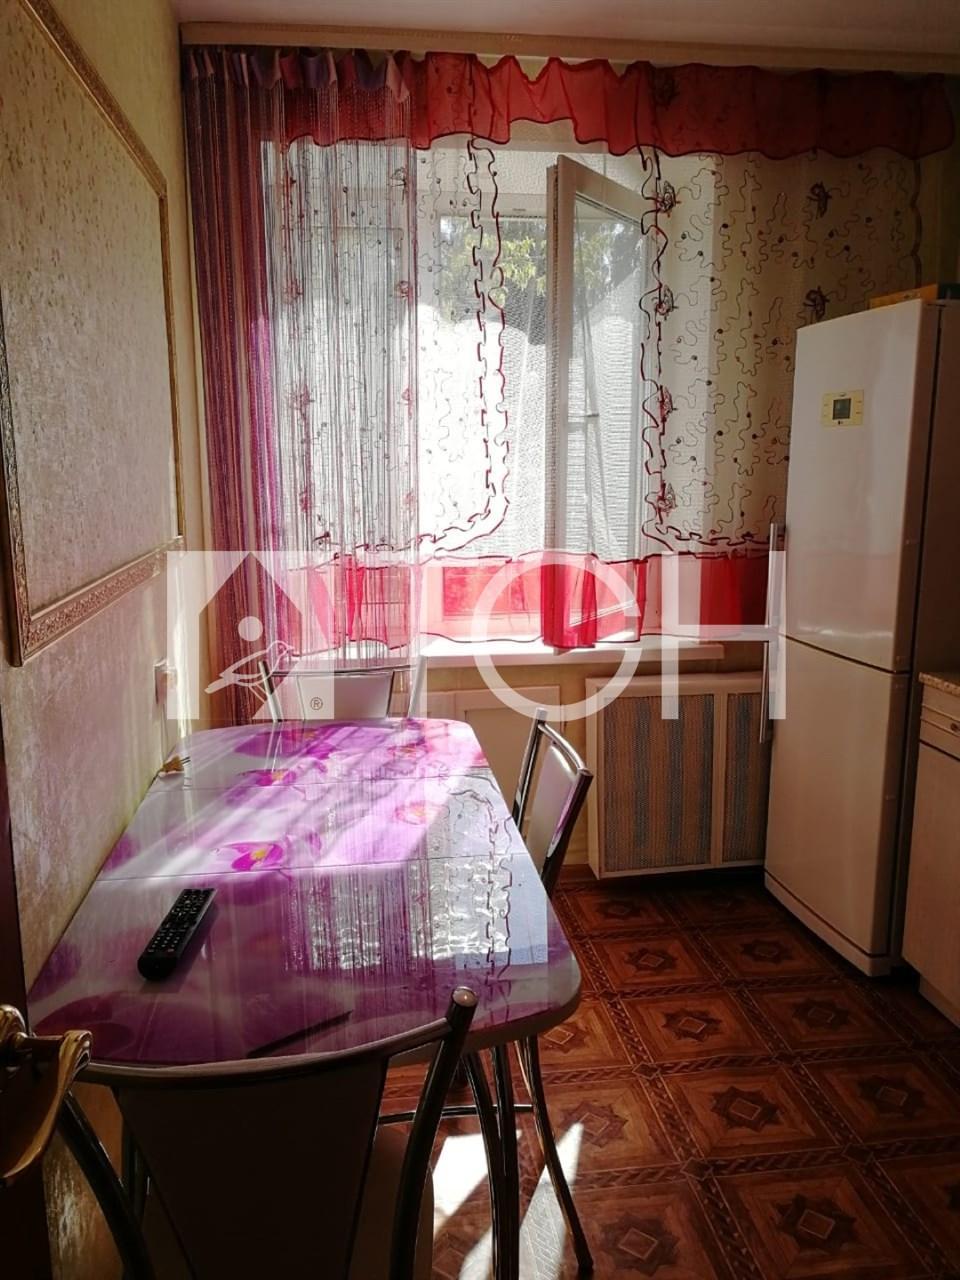 Квартира, 1 комната, 35 м² в Щелково 89261425000 купить 2